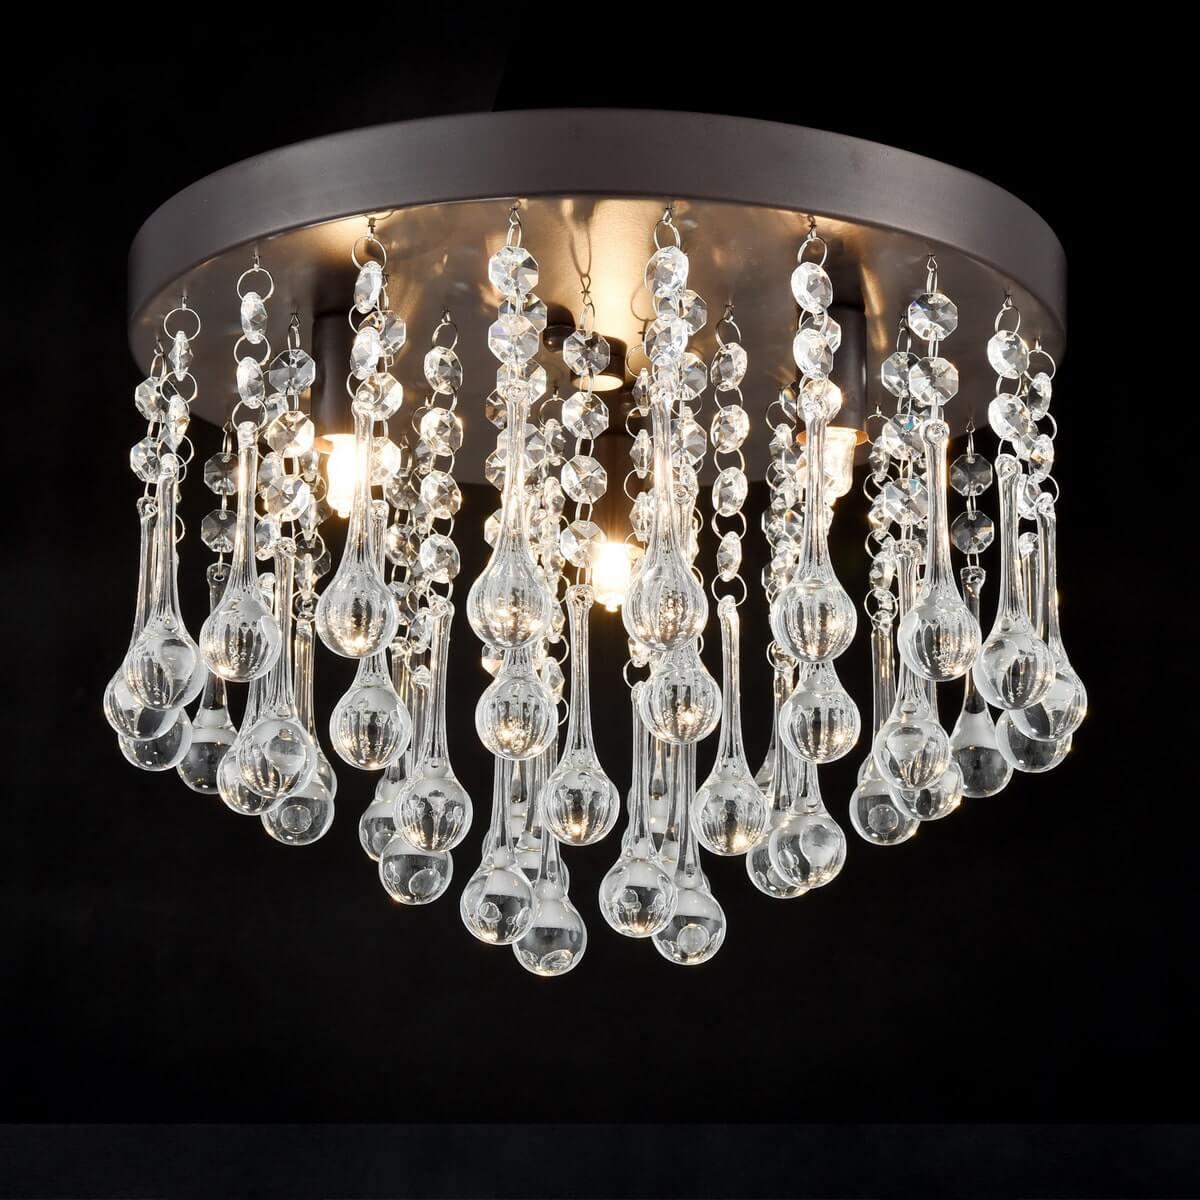 Vintage Bronze Crystal Ceiling Light 3-Light Fixture